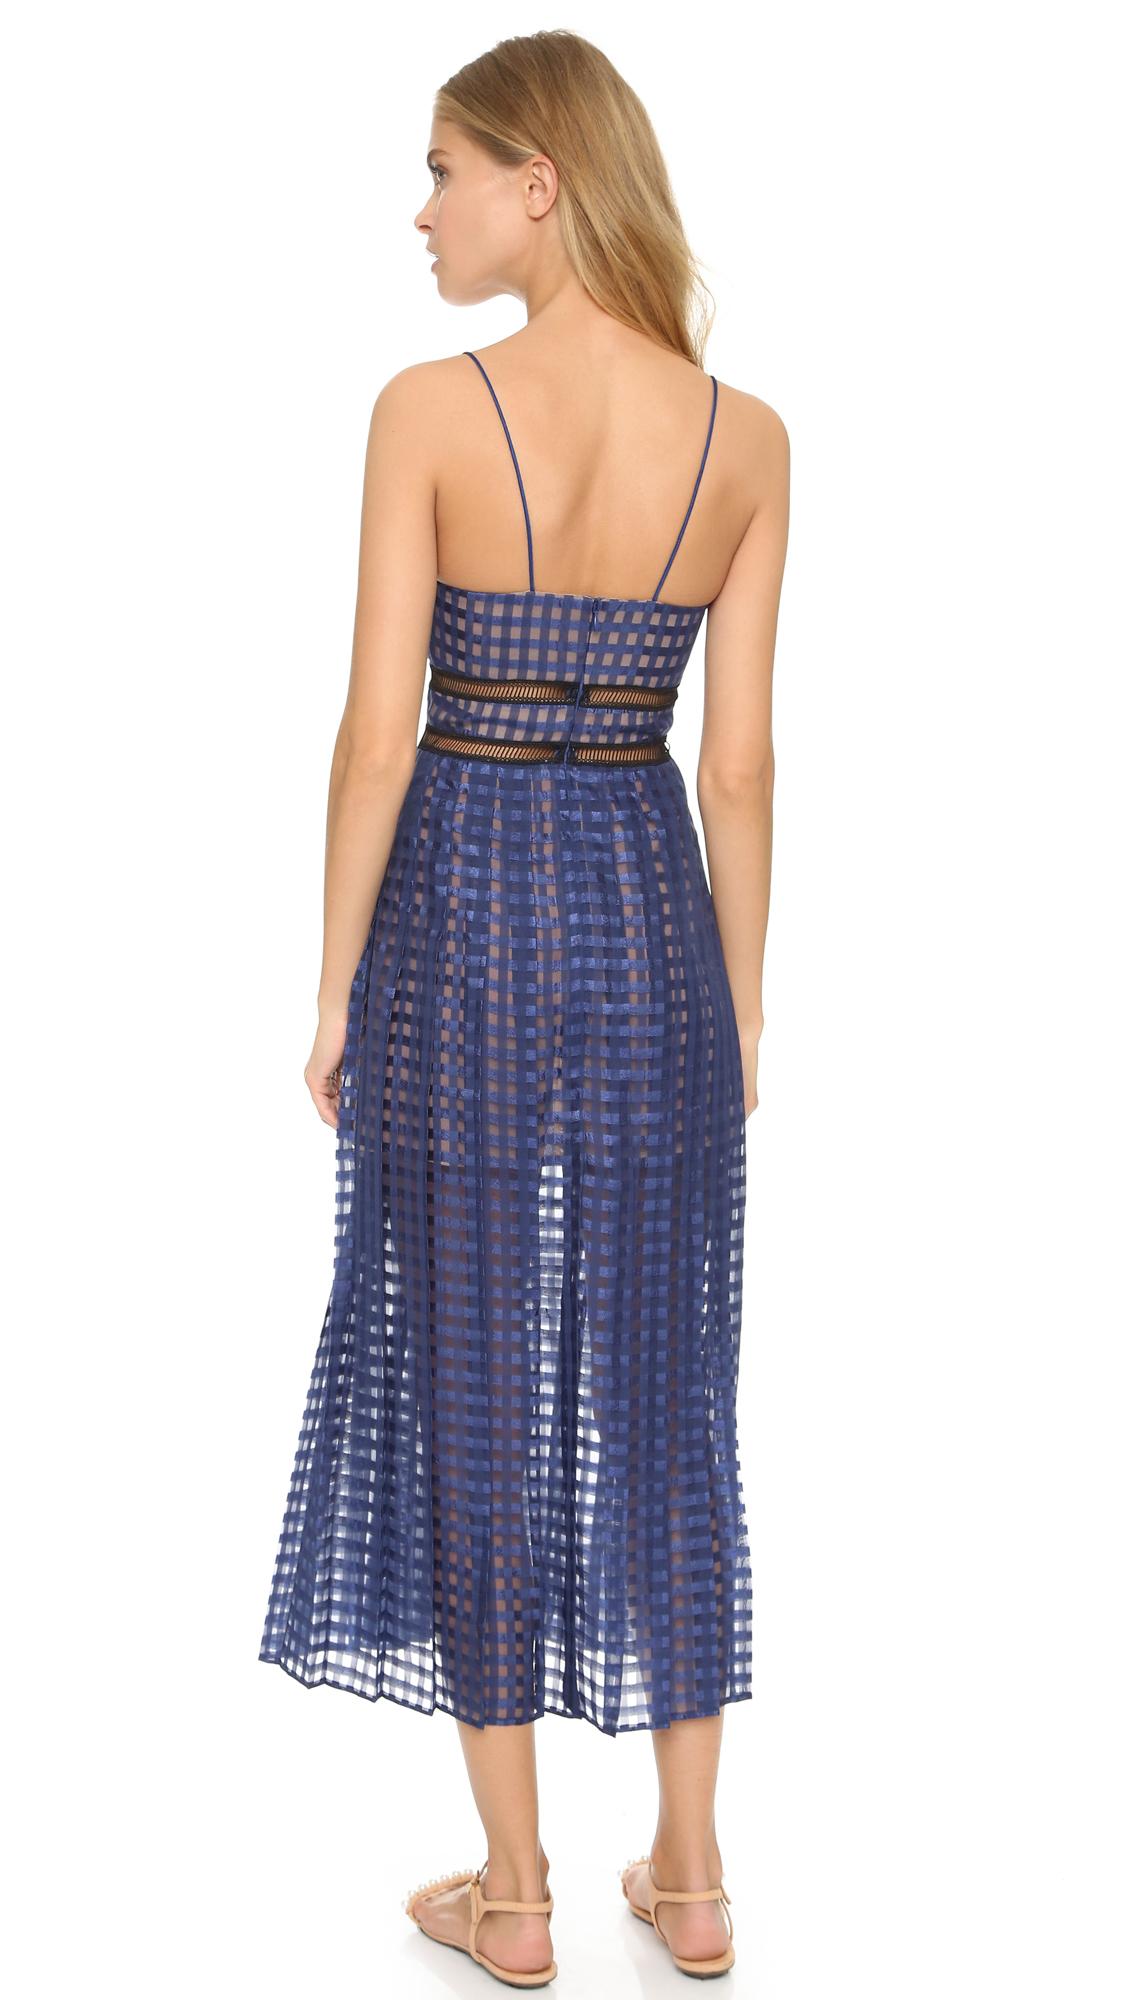 Self Portrait Box Pleated Cami Dress Shopbop Gm Fuse Split